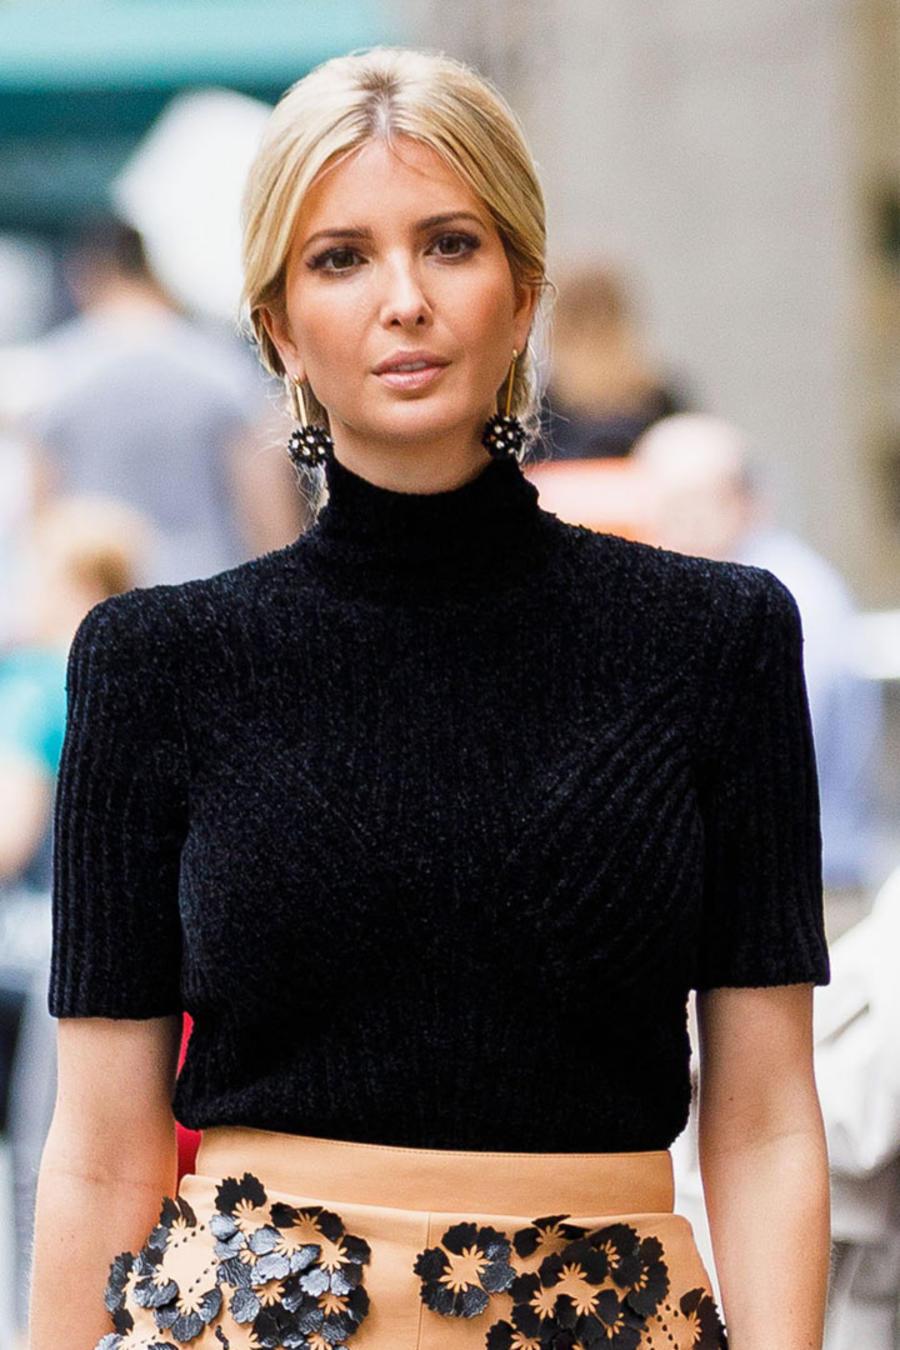 Ivanka Trump con suéter negro